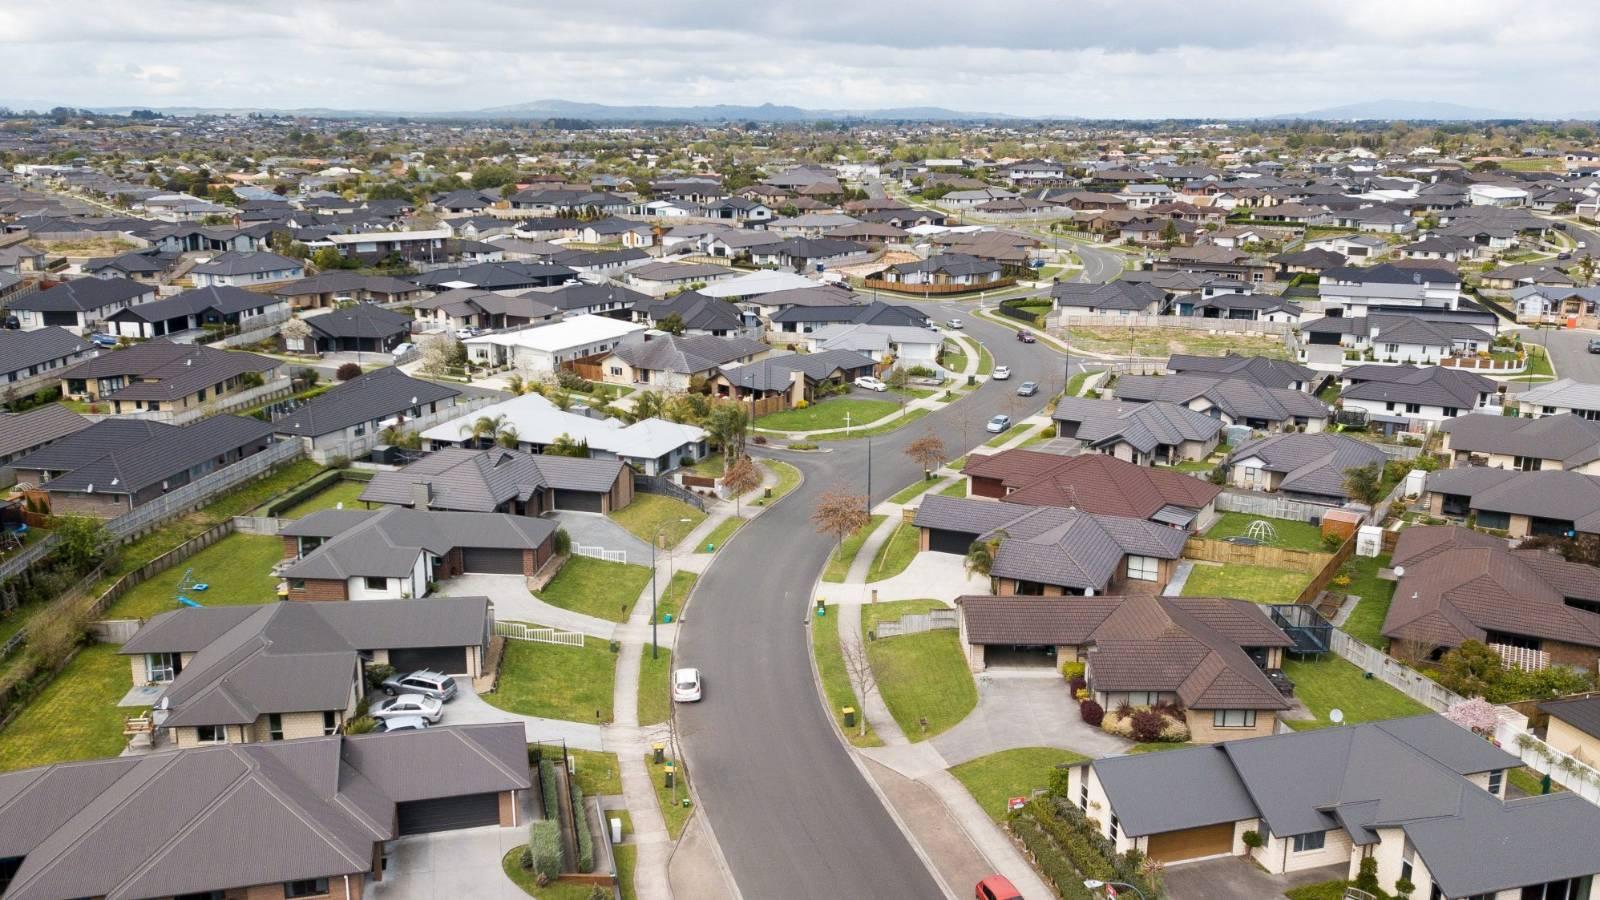 Fears of 'holus-bolus' development under new rules